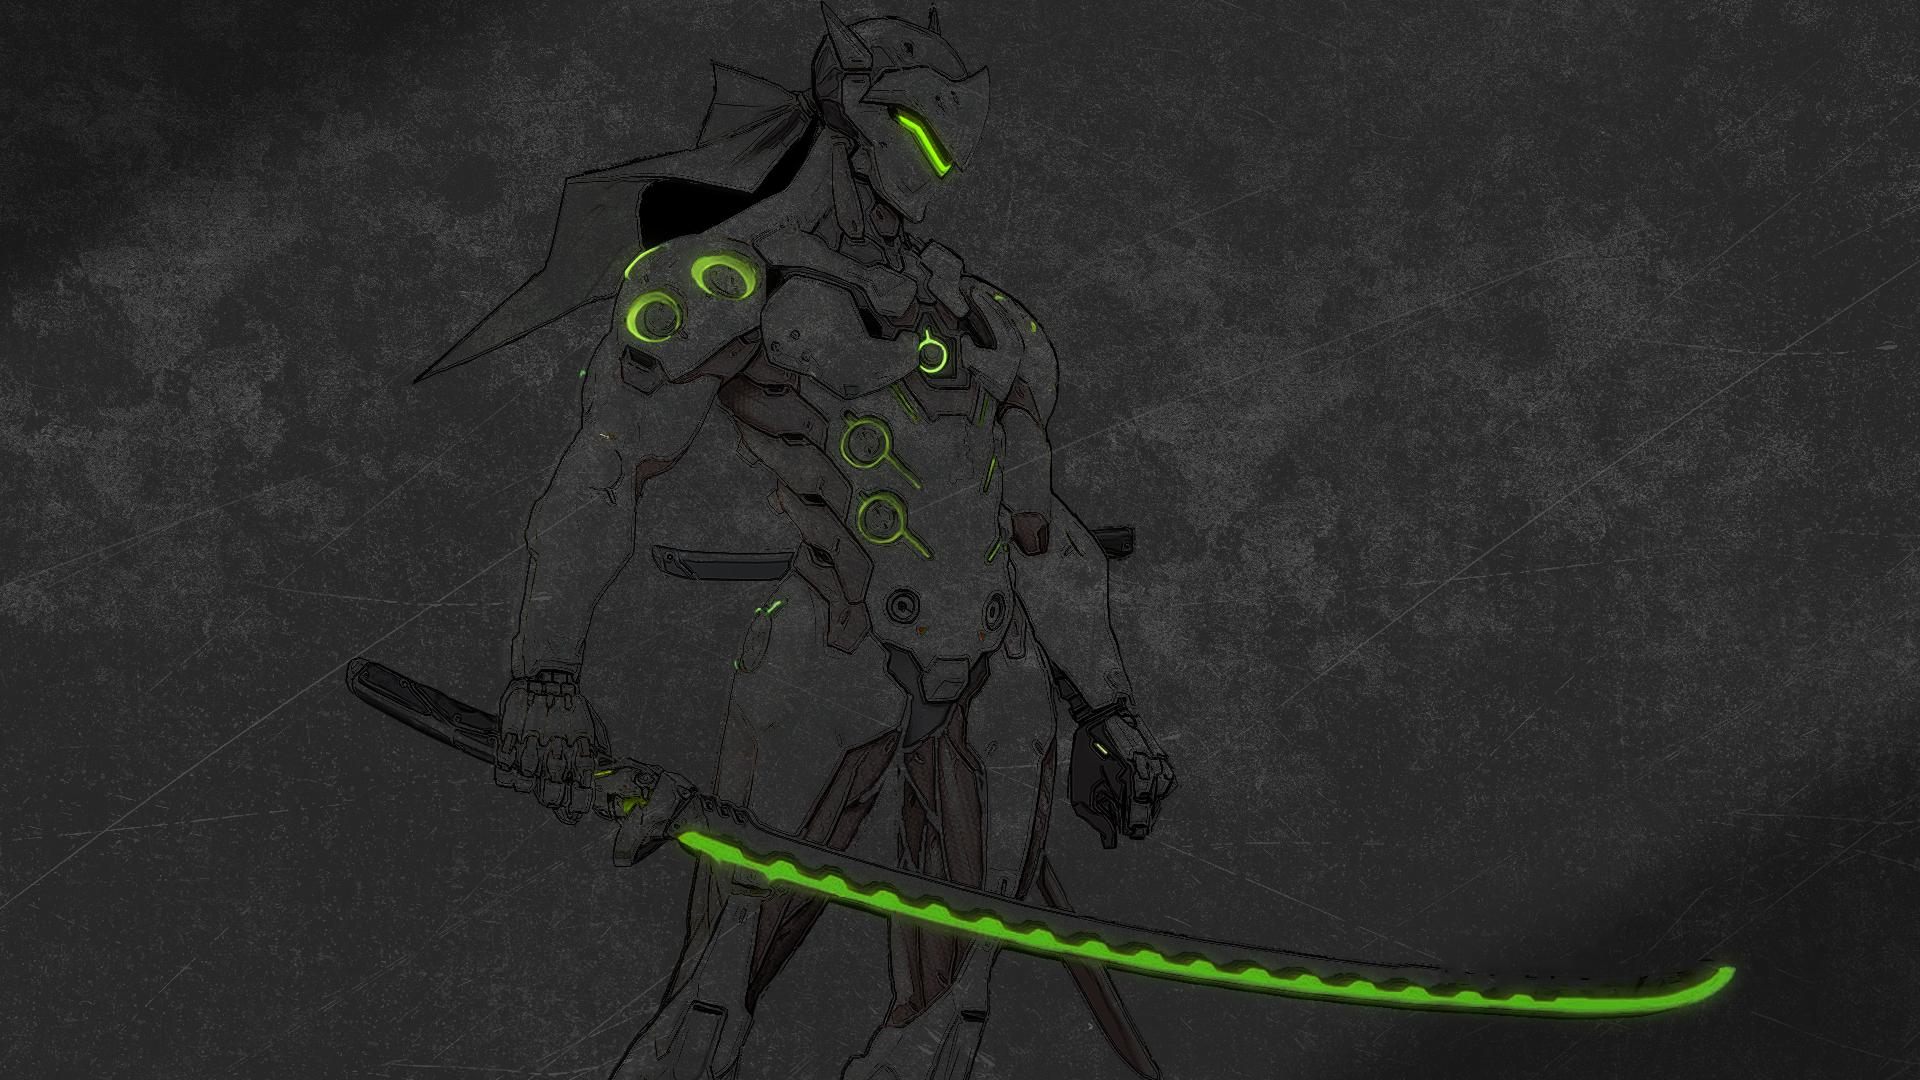 General 1920x1080 Genji (Overwatch) Overwatch dark